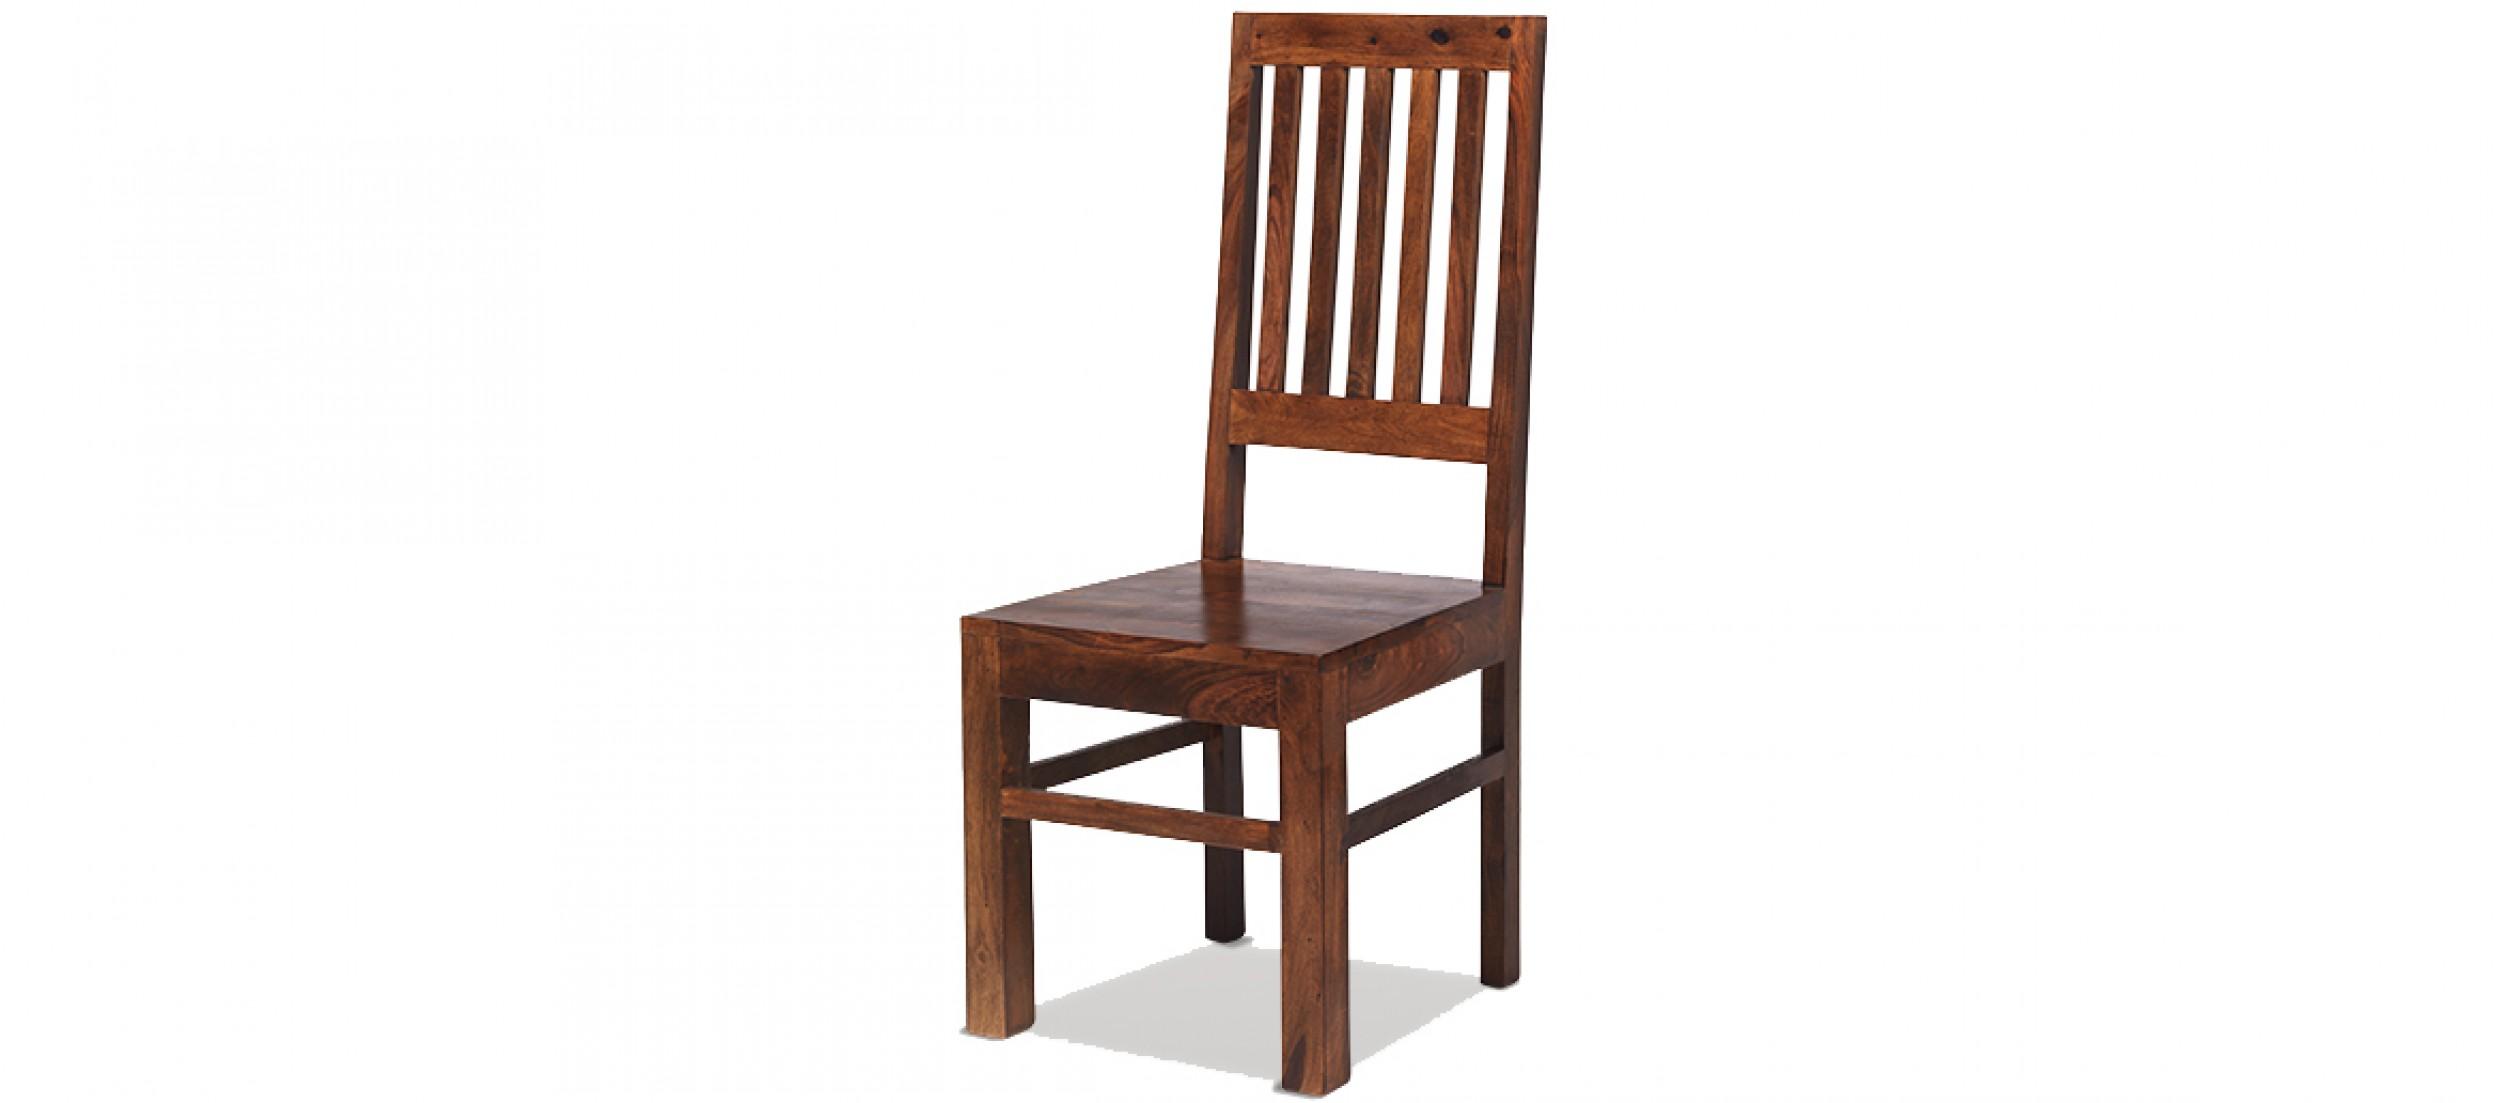 Sheesham high back slat dining chairs pair